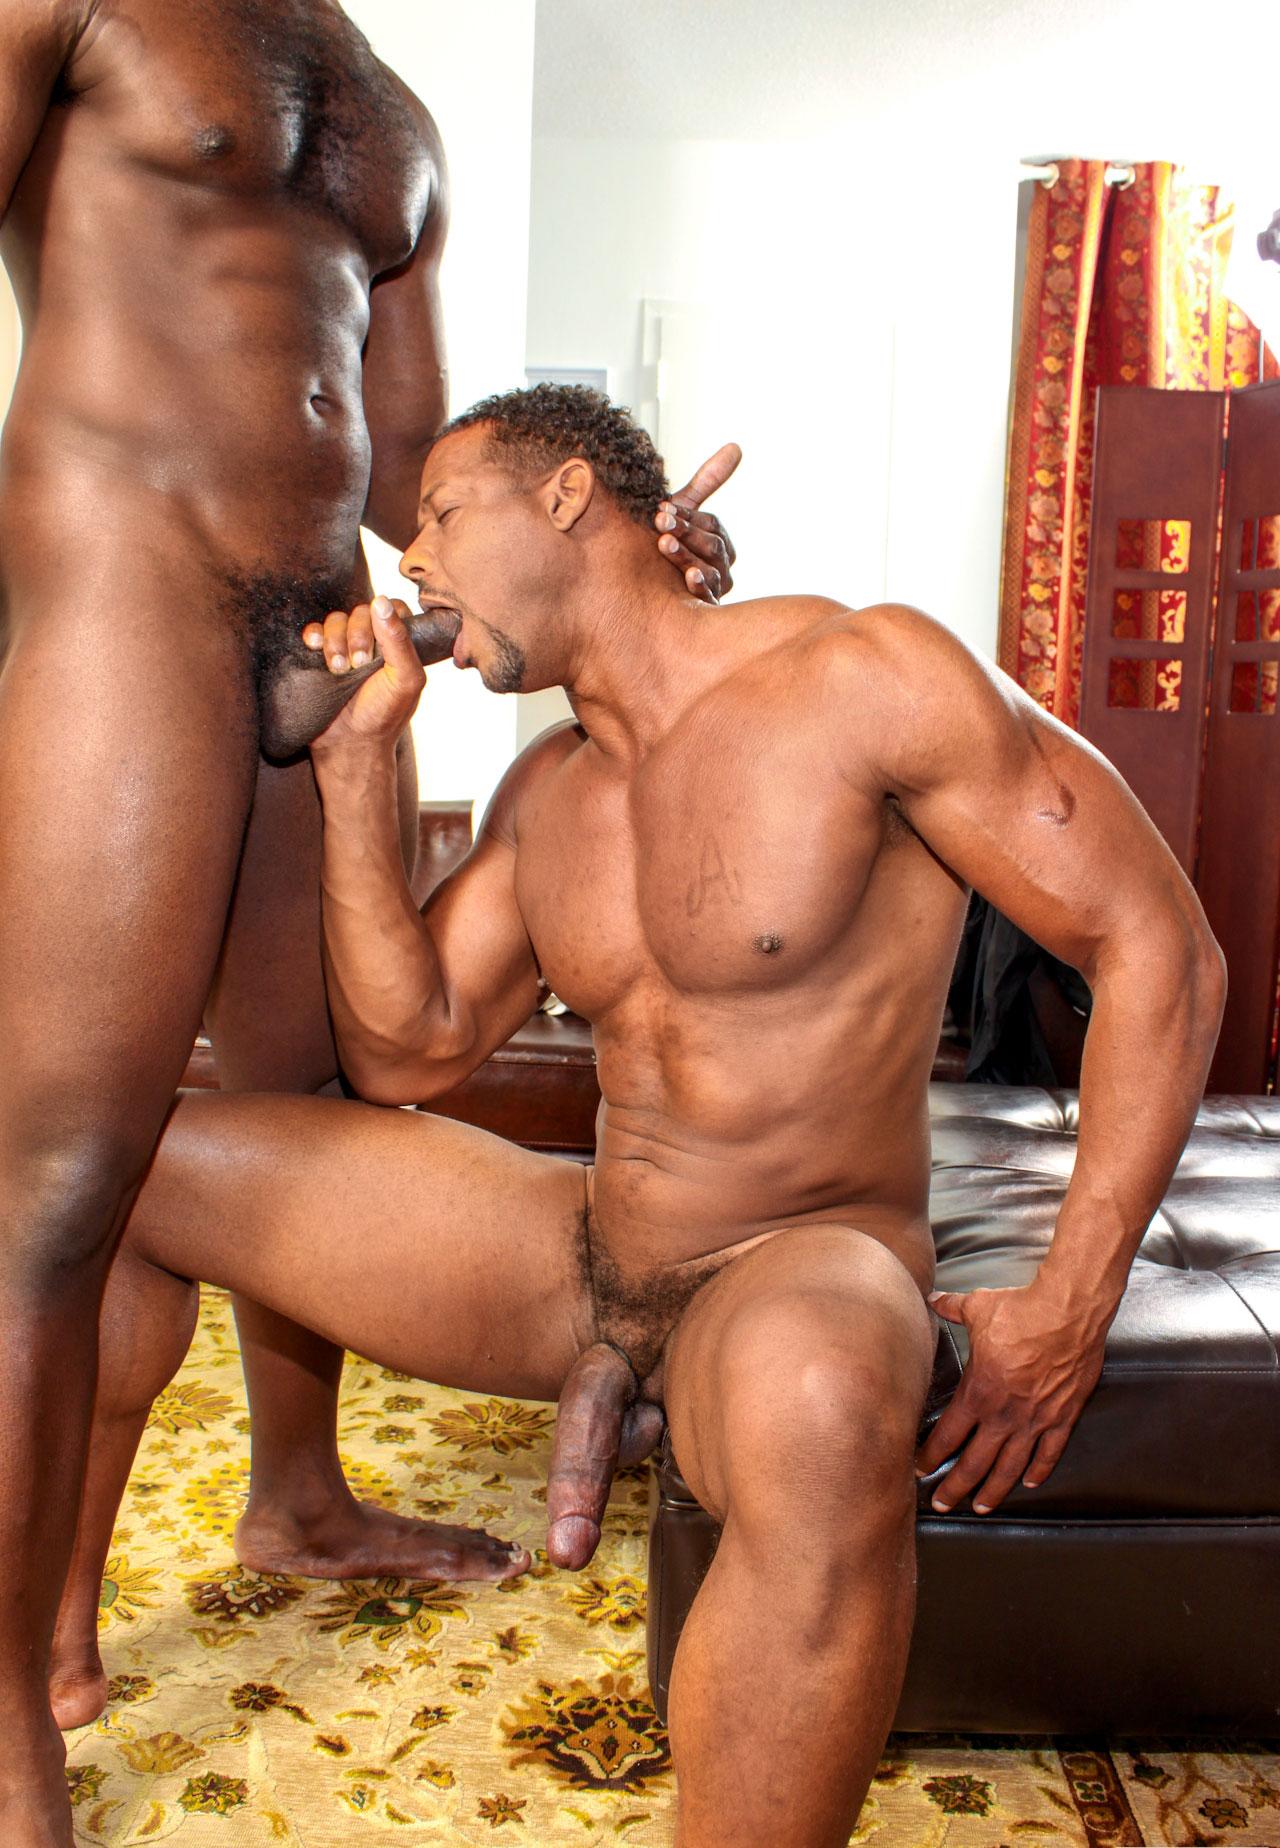 Negros Posando Desnudos Porno Gey porno gay hombres negros sementales calientes galerias fotos